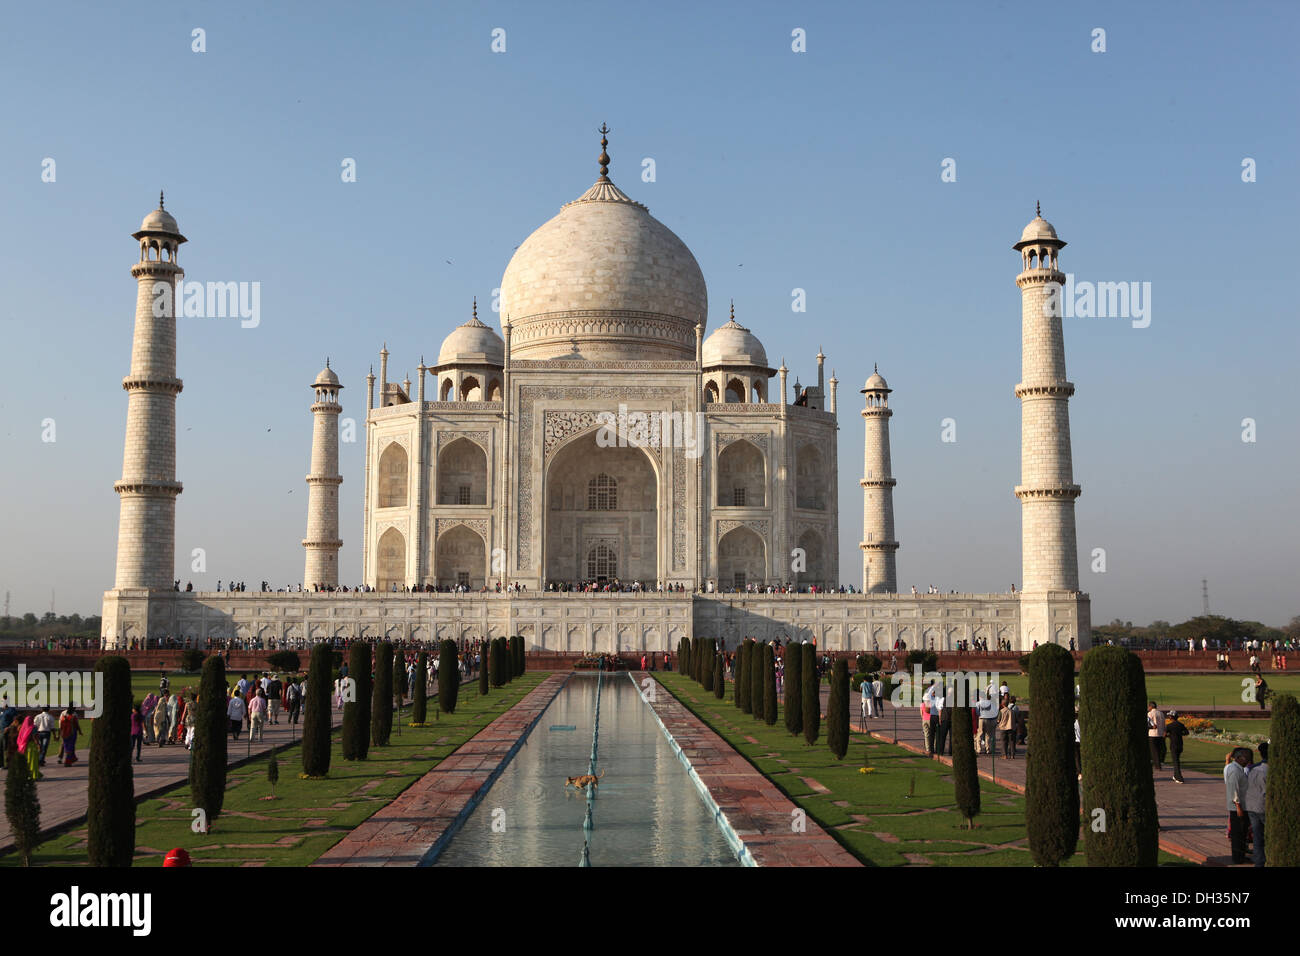 Taj Mahal, Agra, Uttar Pradesh, India, Asia Imagen De Stock